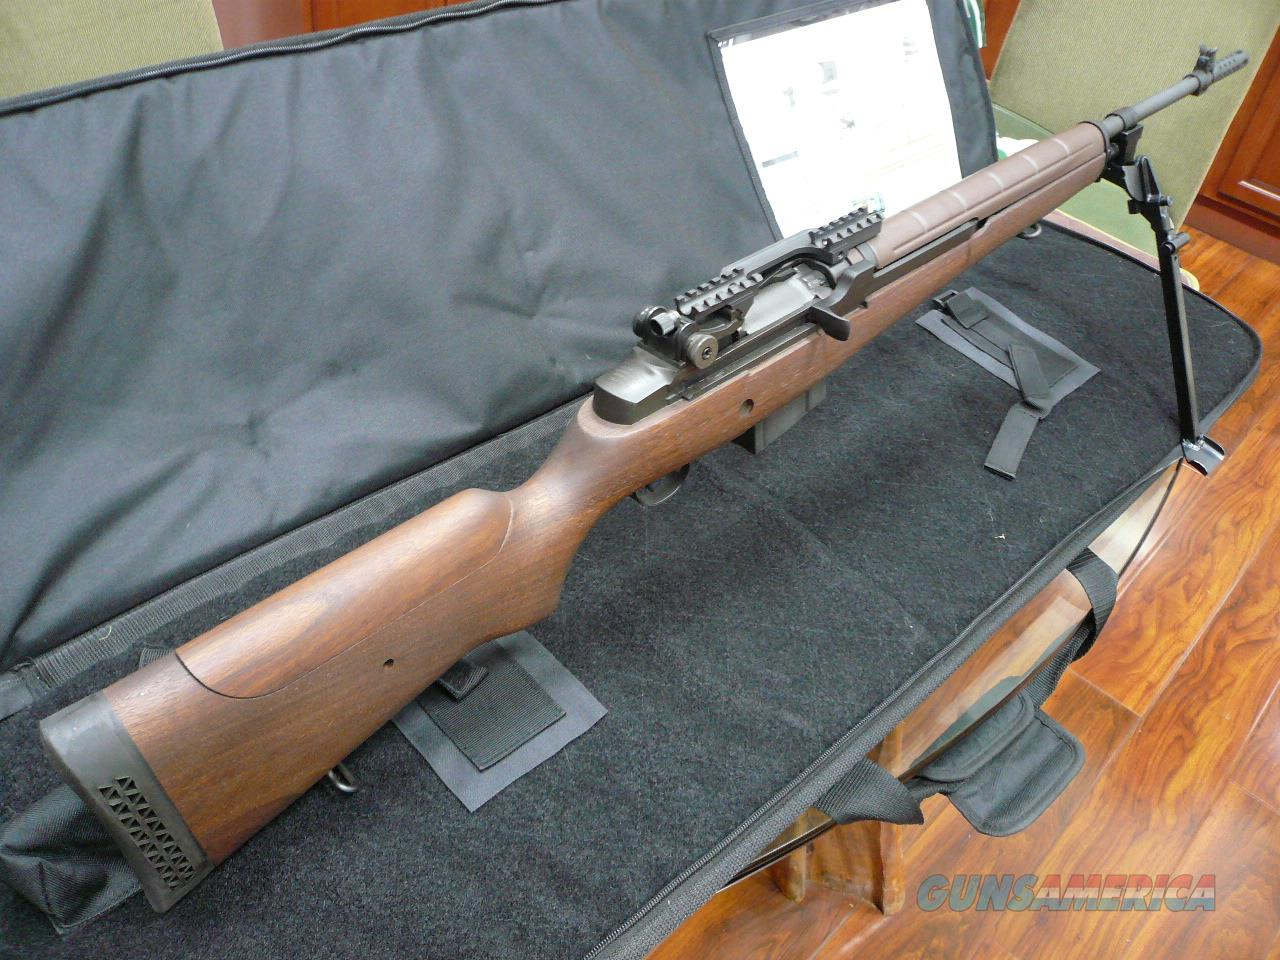 M21/M1A (DISCONTINUED) 308NATO (CA COMPLIENT)  Guns > Rifles > Springfield Armory Rifles > M1A/M14